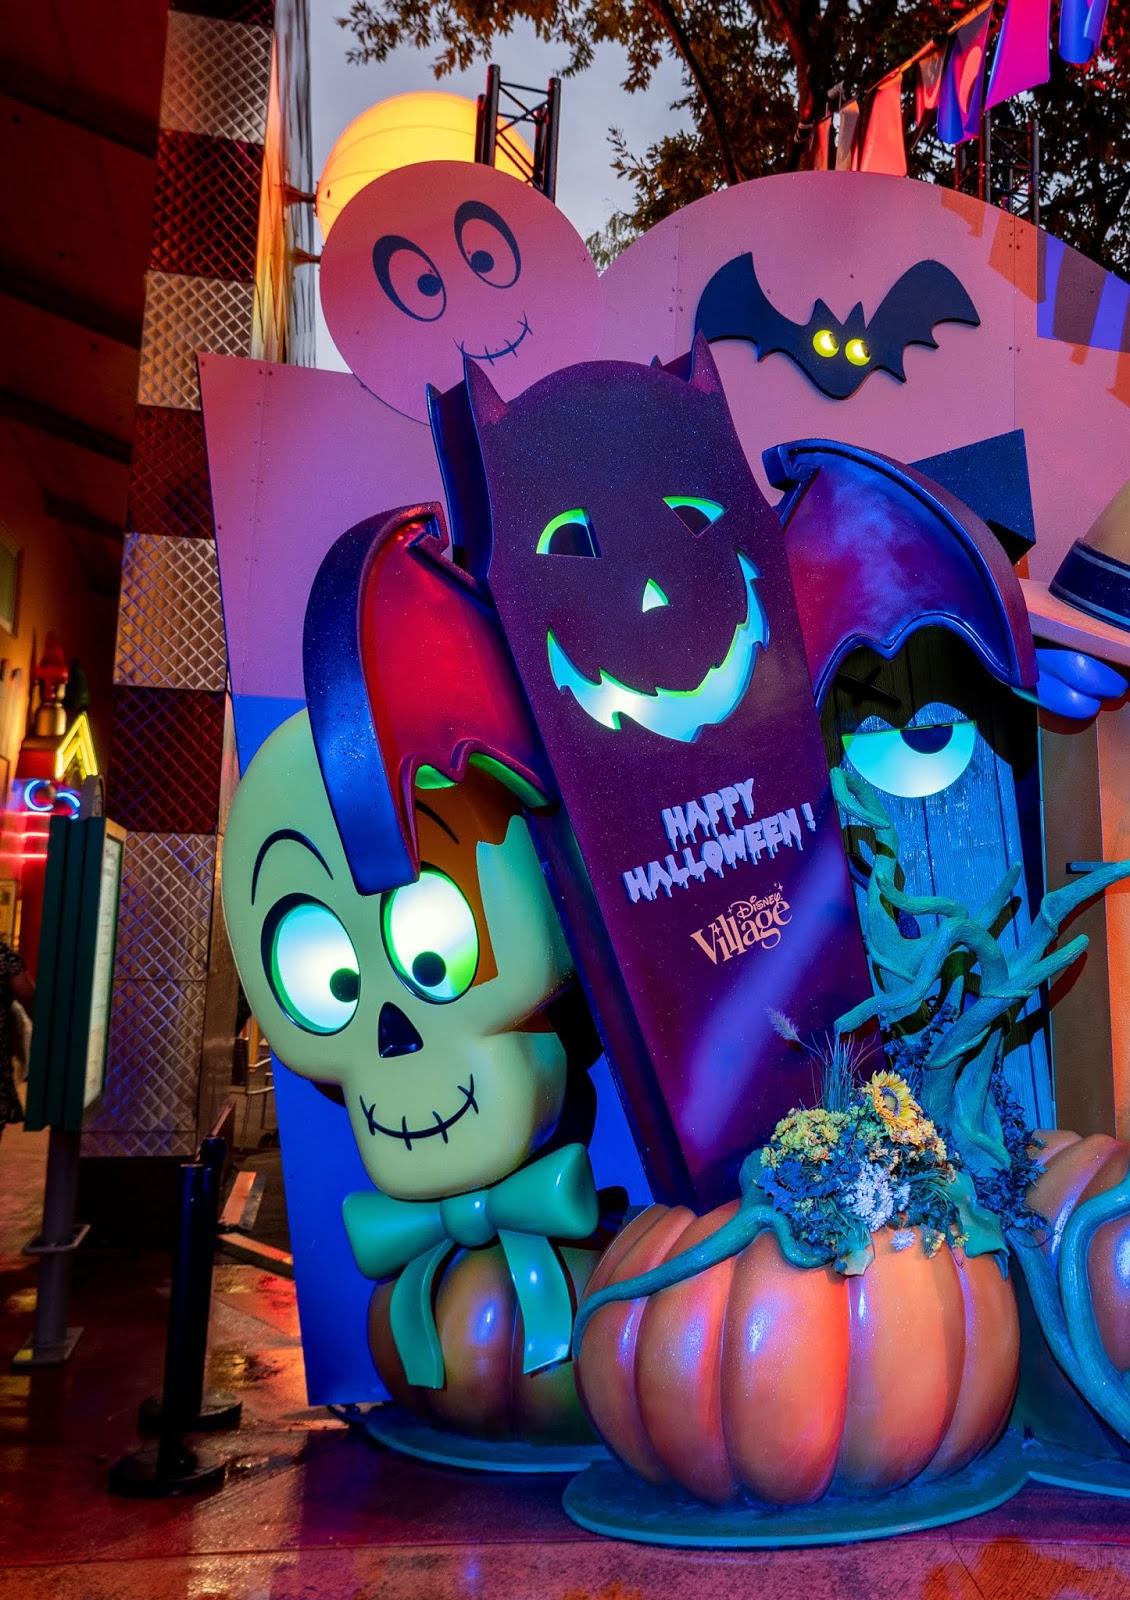 Halloween decorations in the Disney Village, Disneyland Paris